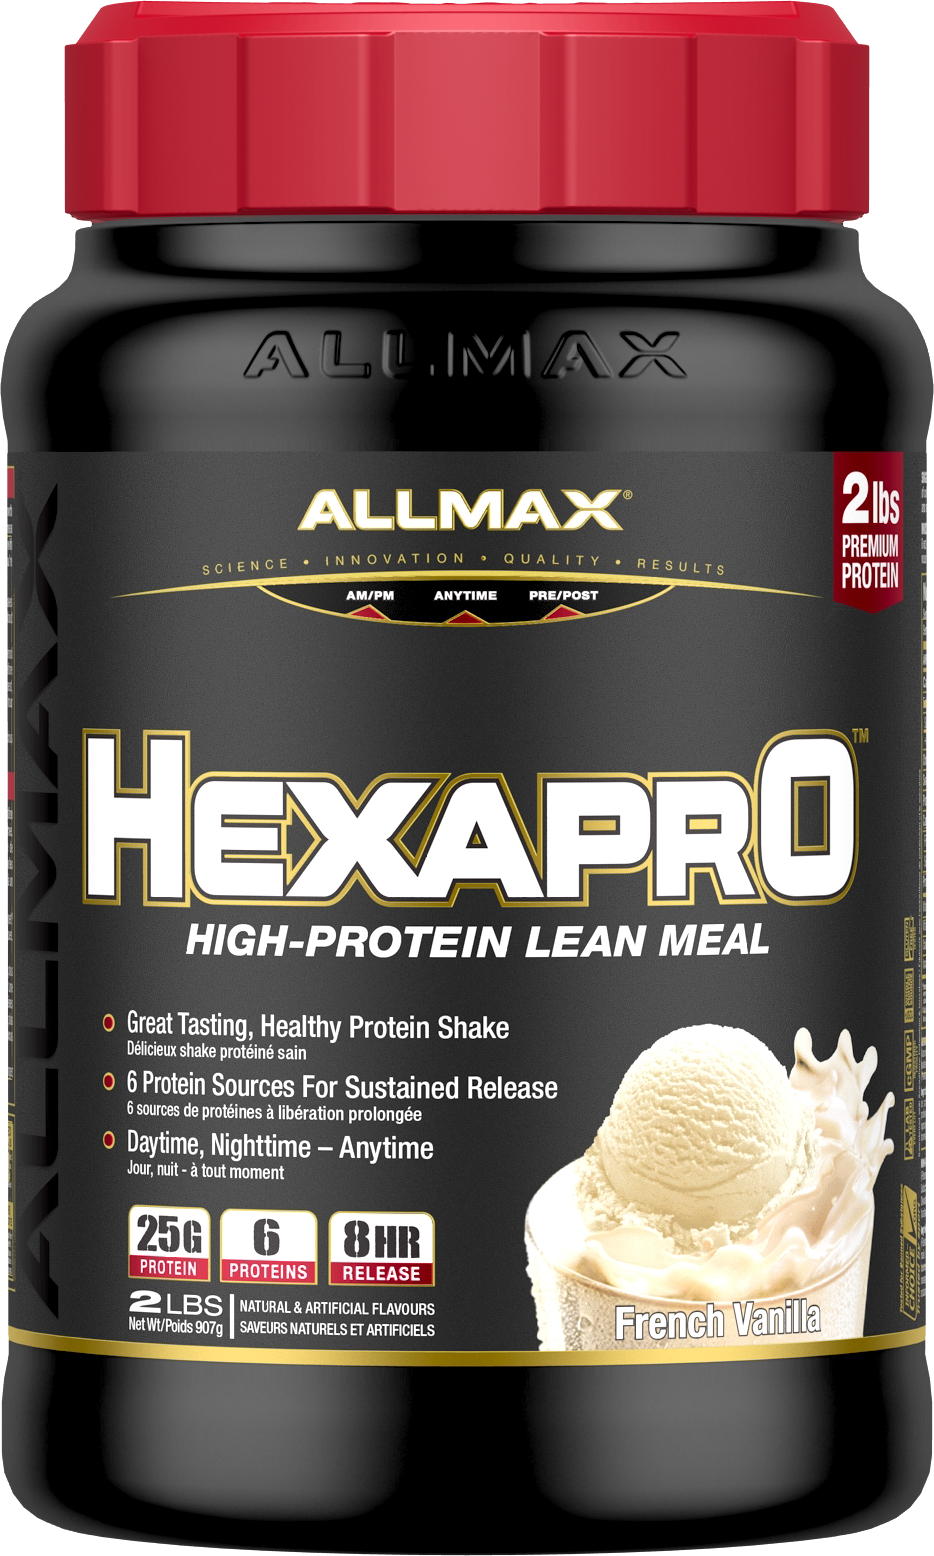 Allmax Nutrition Allmax - Hexapro - French Vanilla - 3lbs